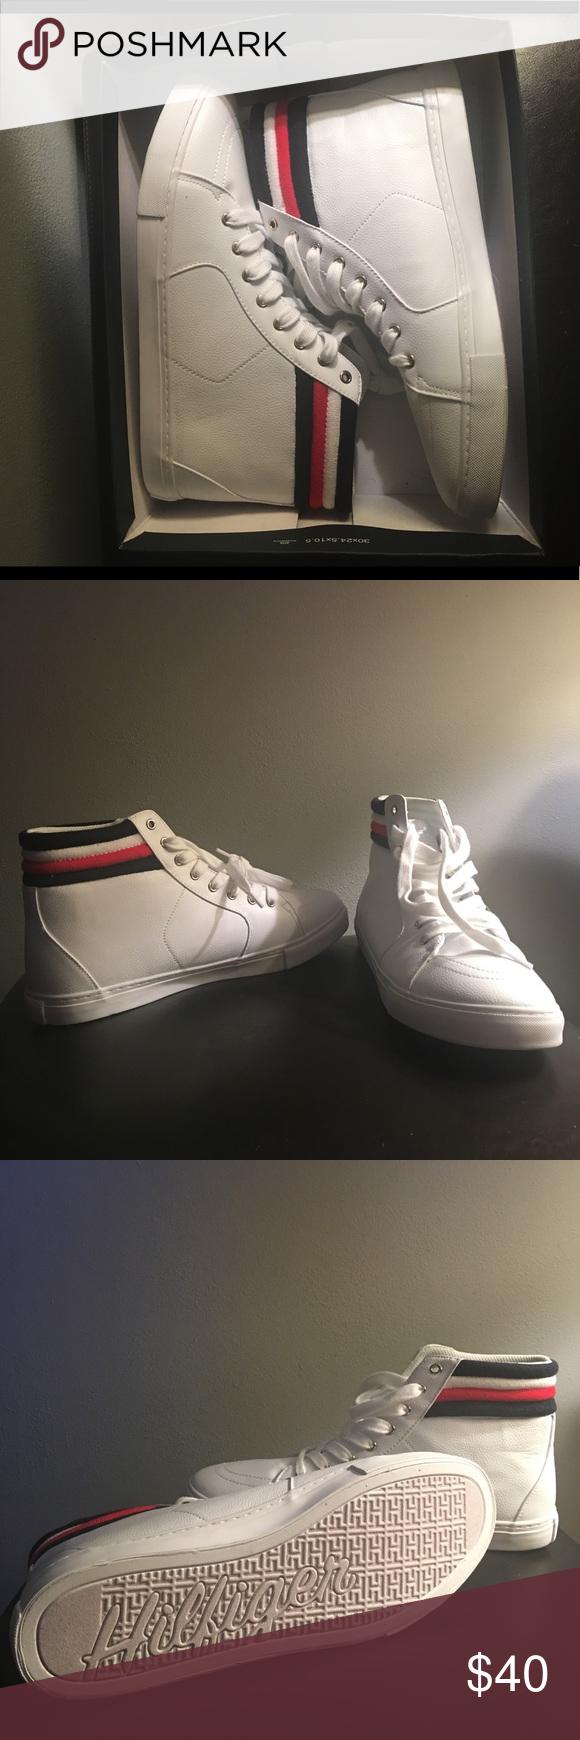 368527b5dde1f Tommy Hilfiger Lowgen Sneaker Tommy Hilfiger Women s Lowgen Hightop Sneaker  Slightly worn but in great condition Women s Size 11M Tommy Hilfiger Shoes  ...